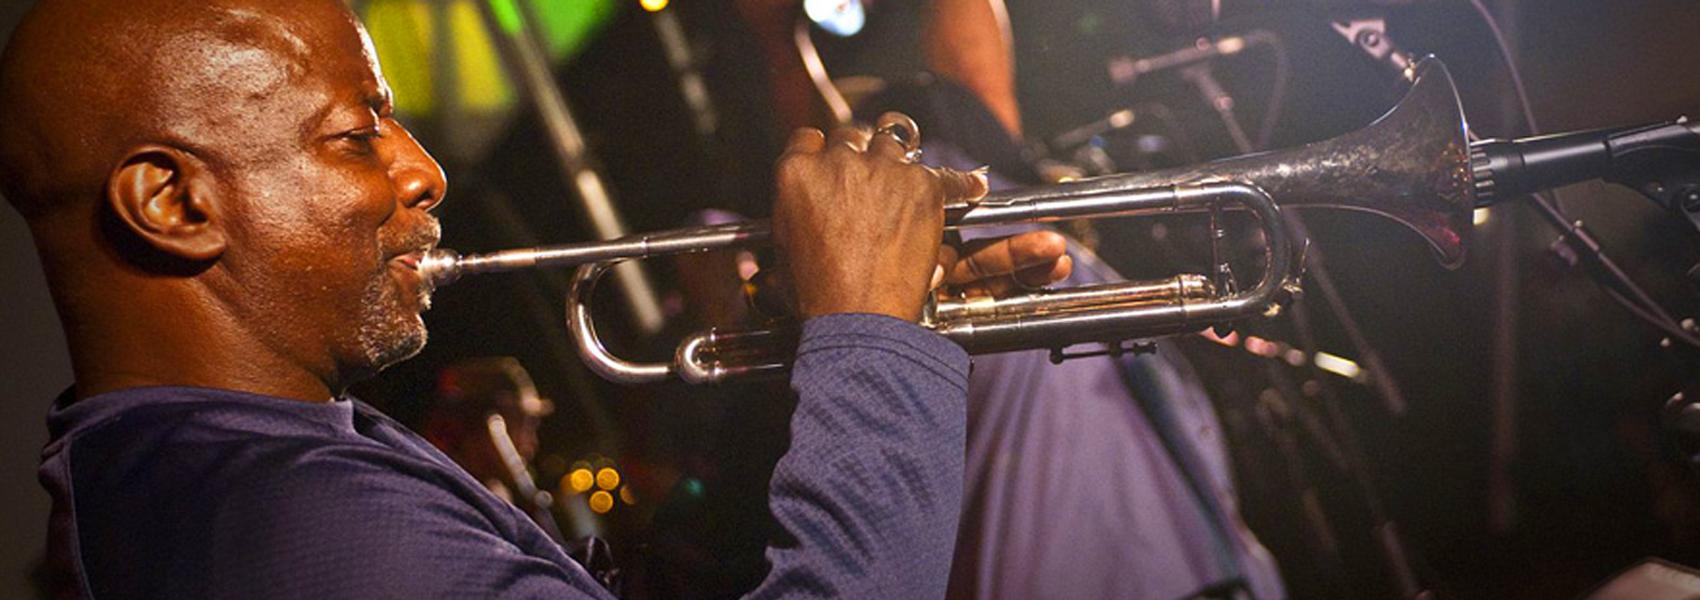 Jazz com learn